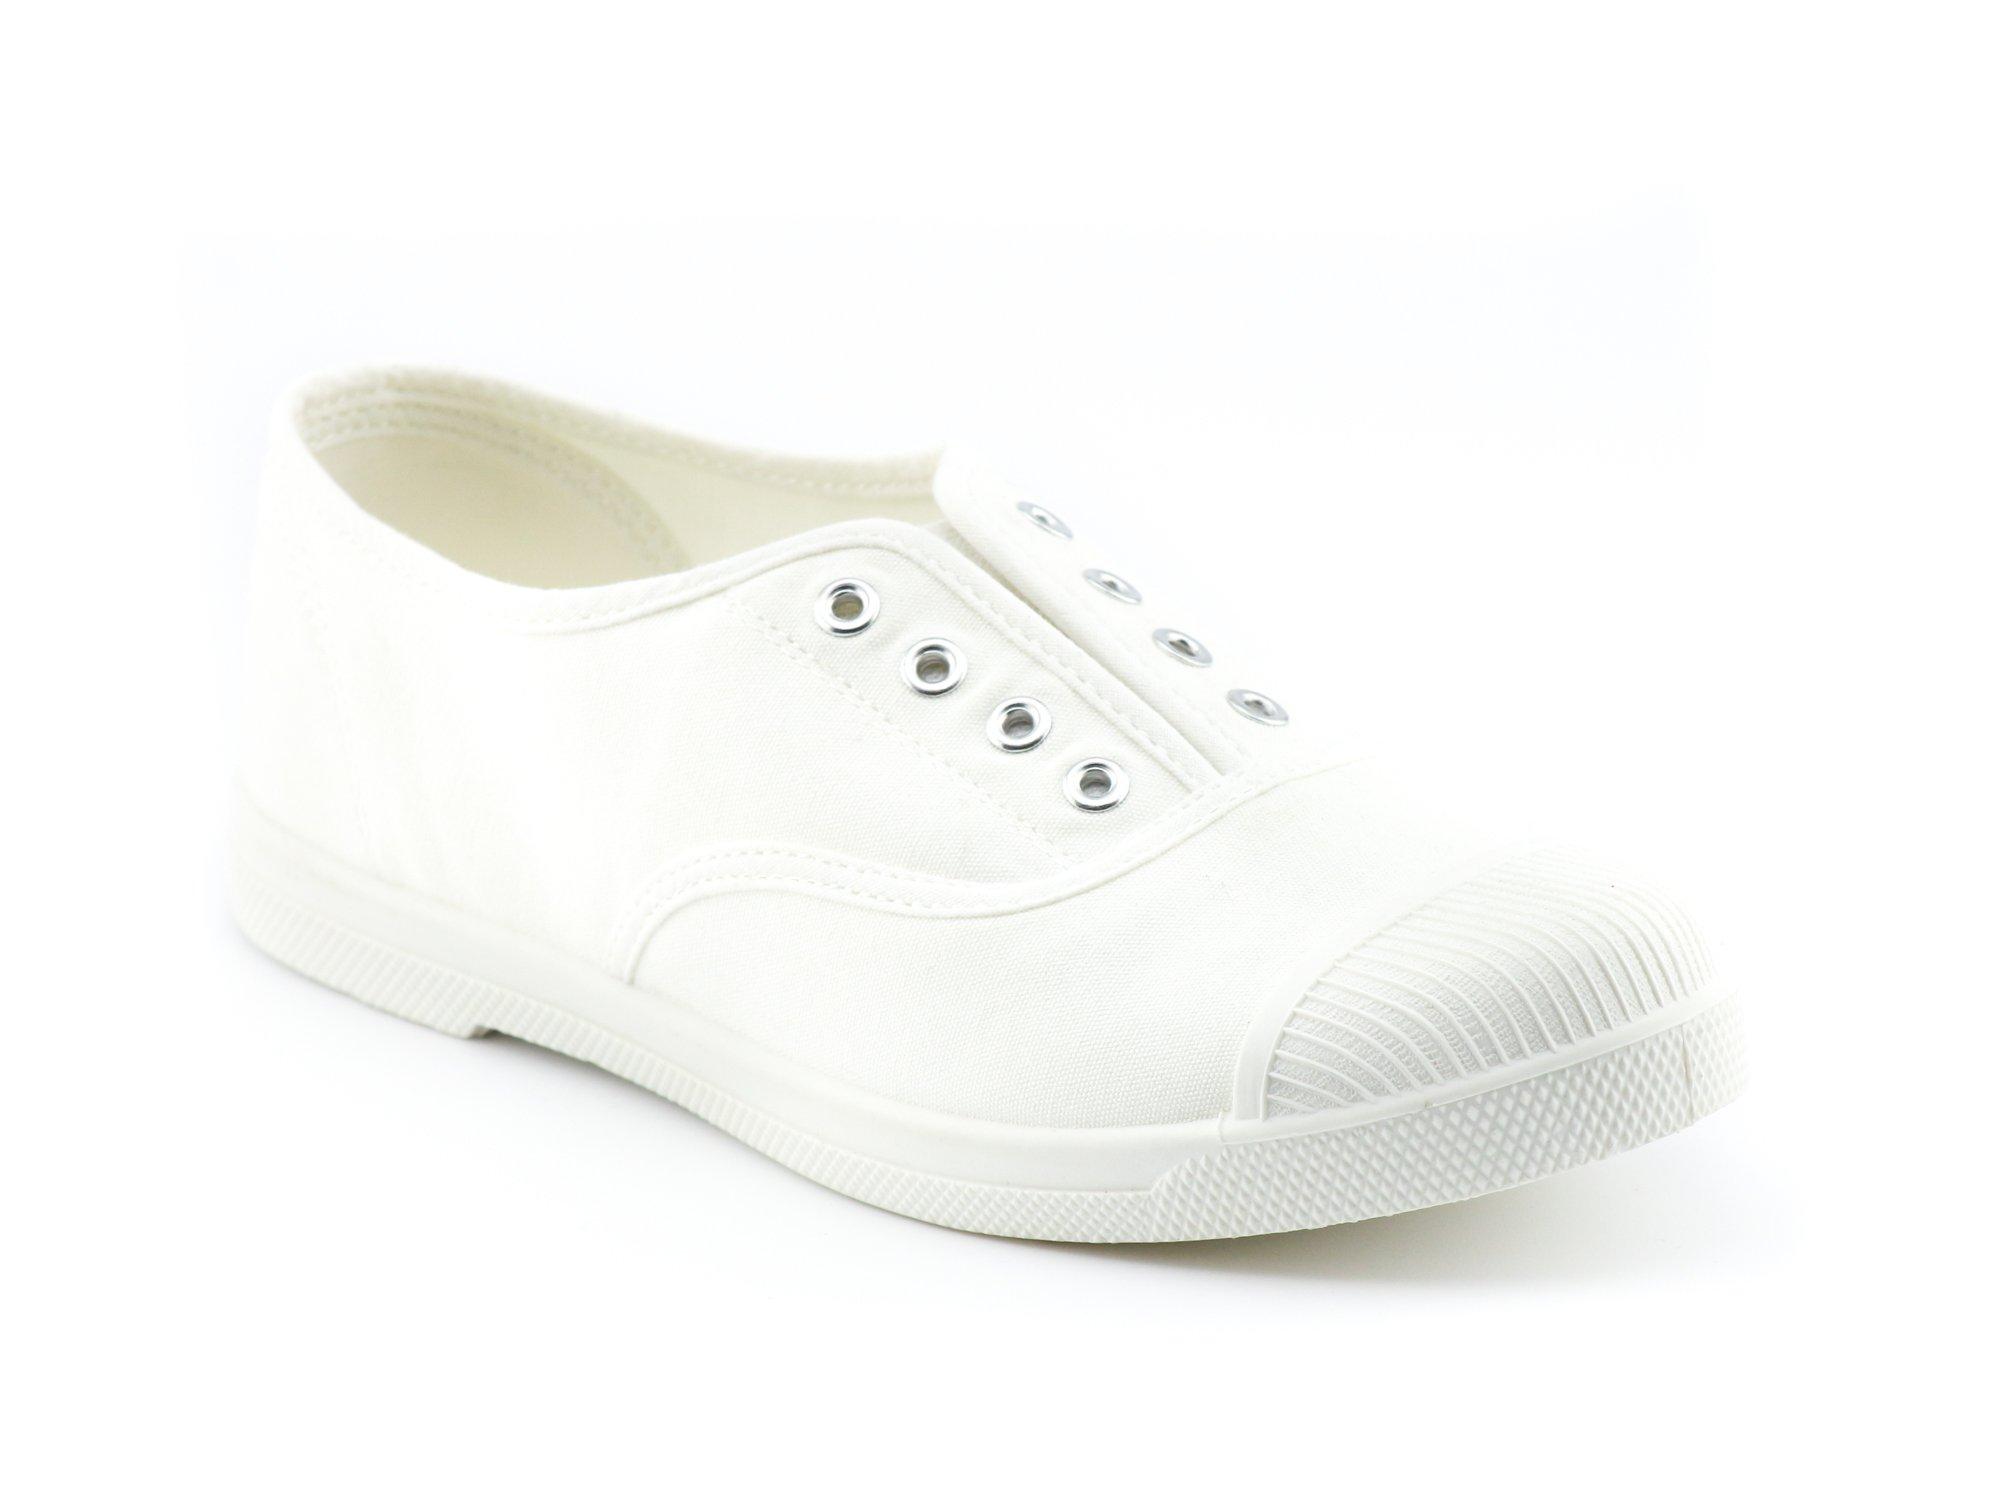 CALICO KIKI JACY-CK01 Women's Canvas Sneakers Flats (8 US White)